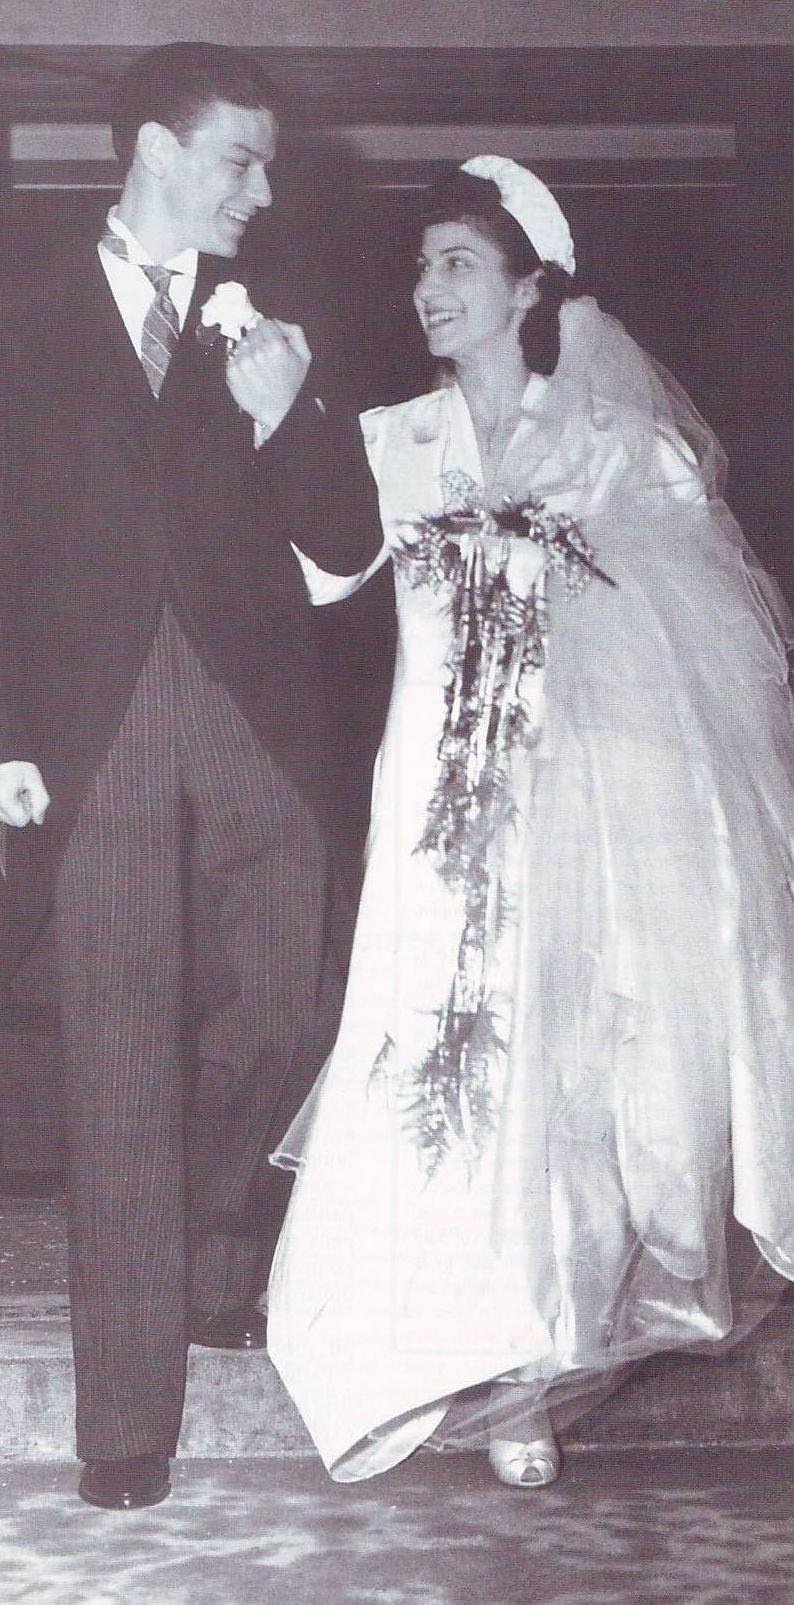 February 4 1939 wedding with nancy barbato in jersey city